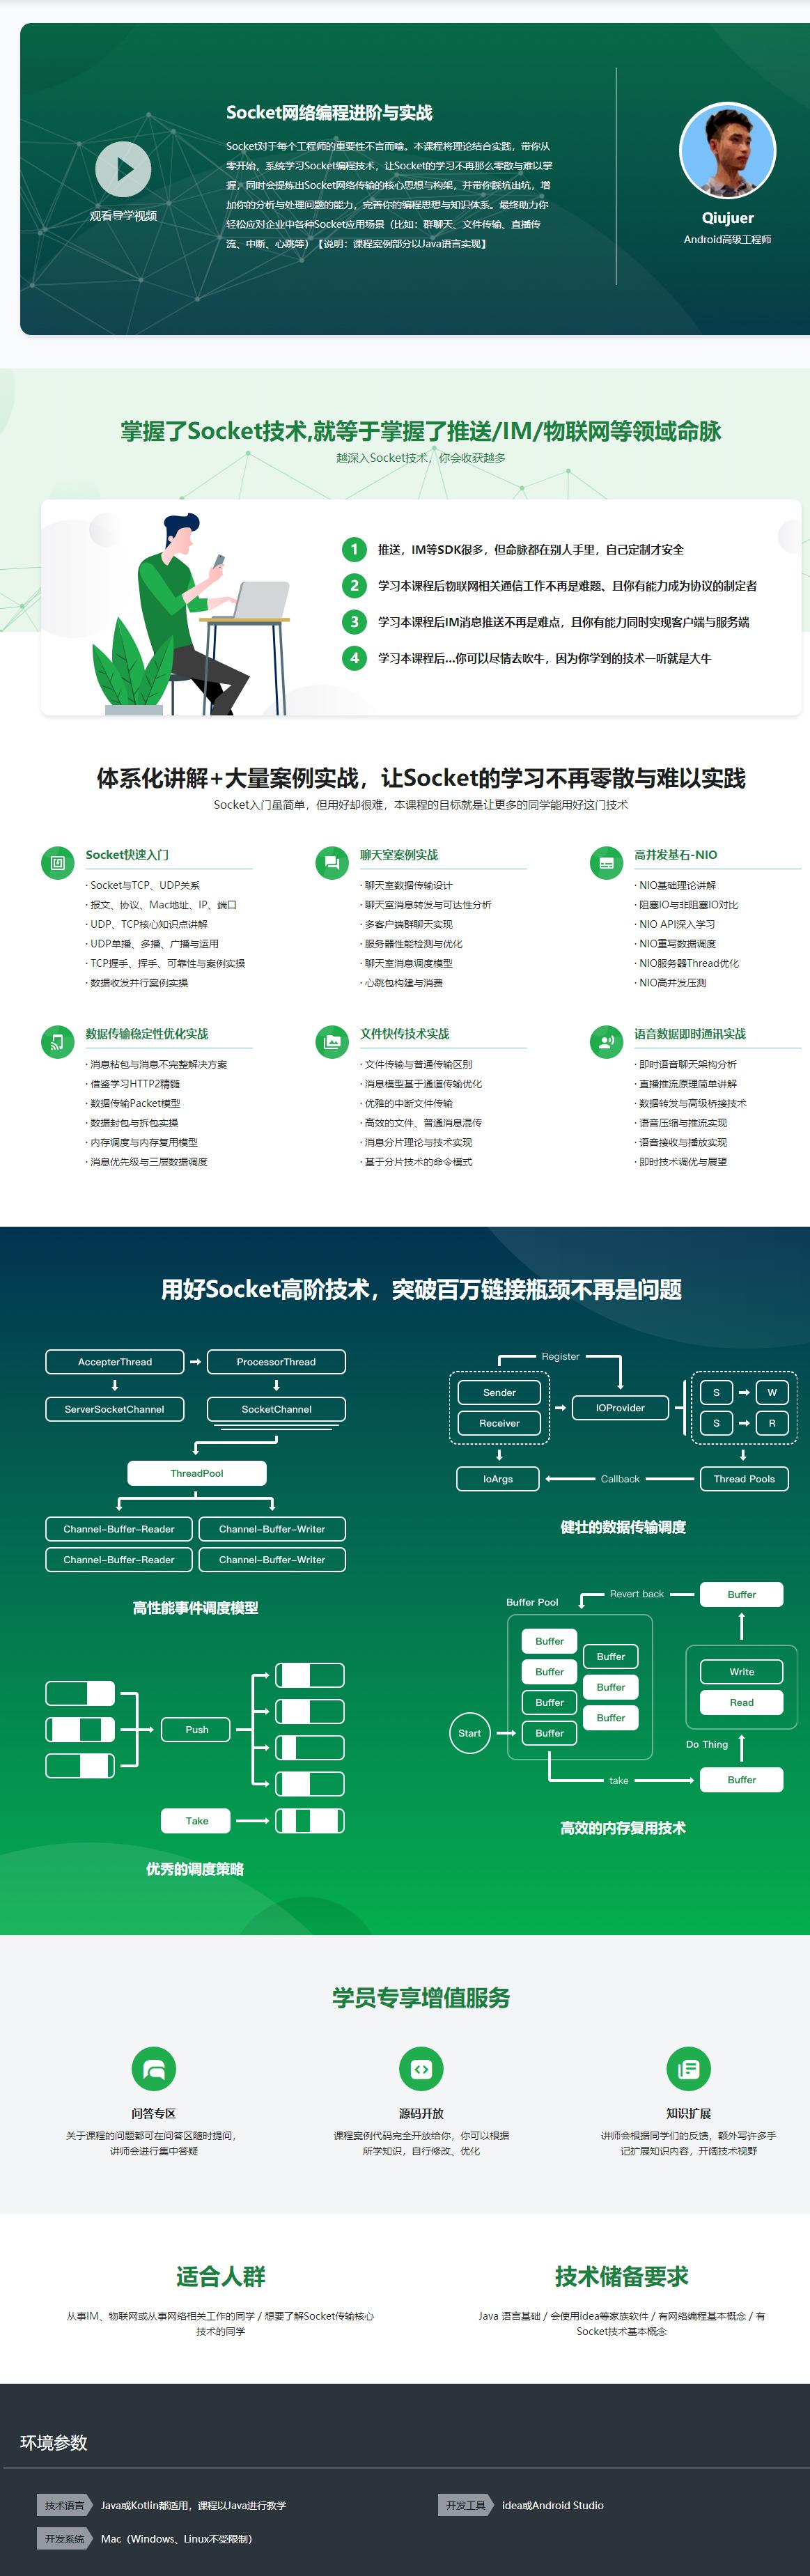 Socket网络编程进阶与实战.png